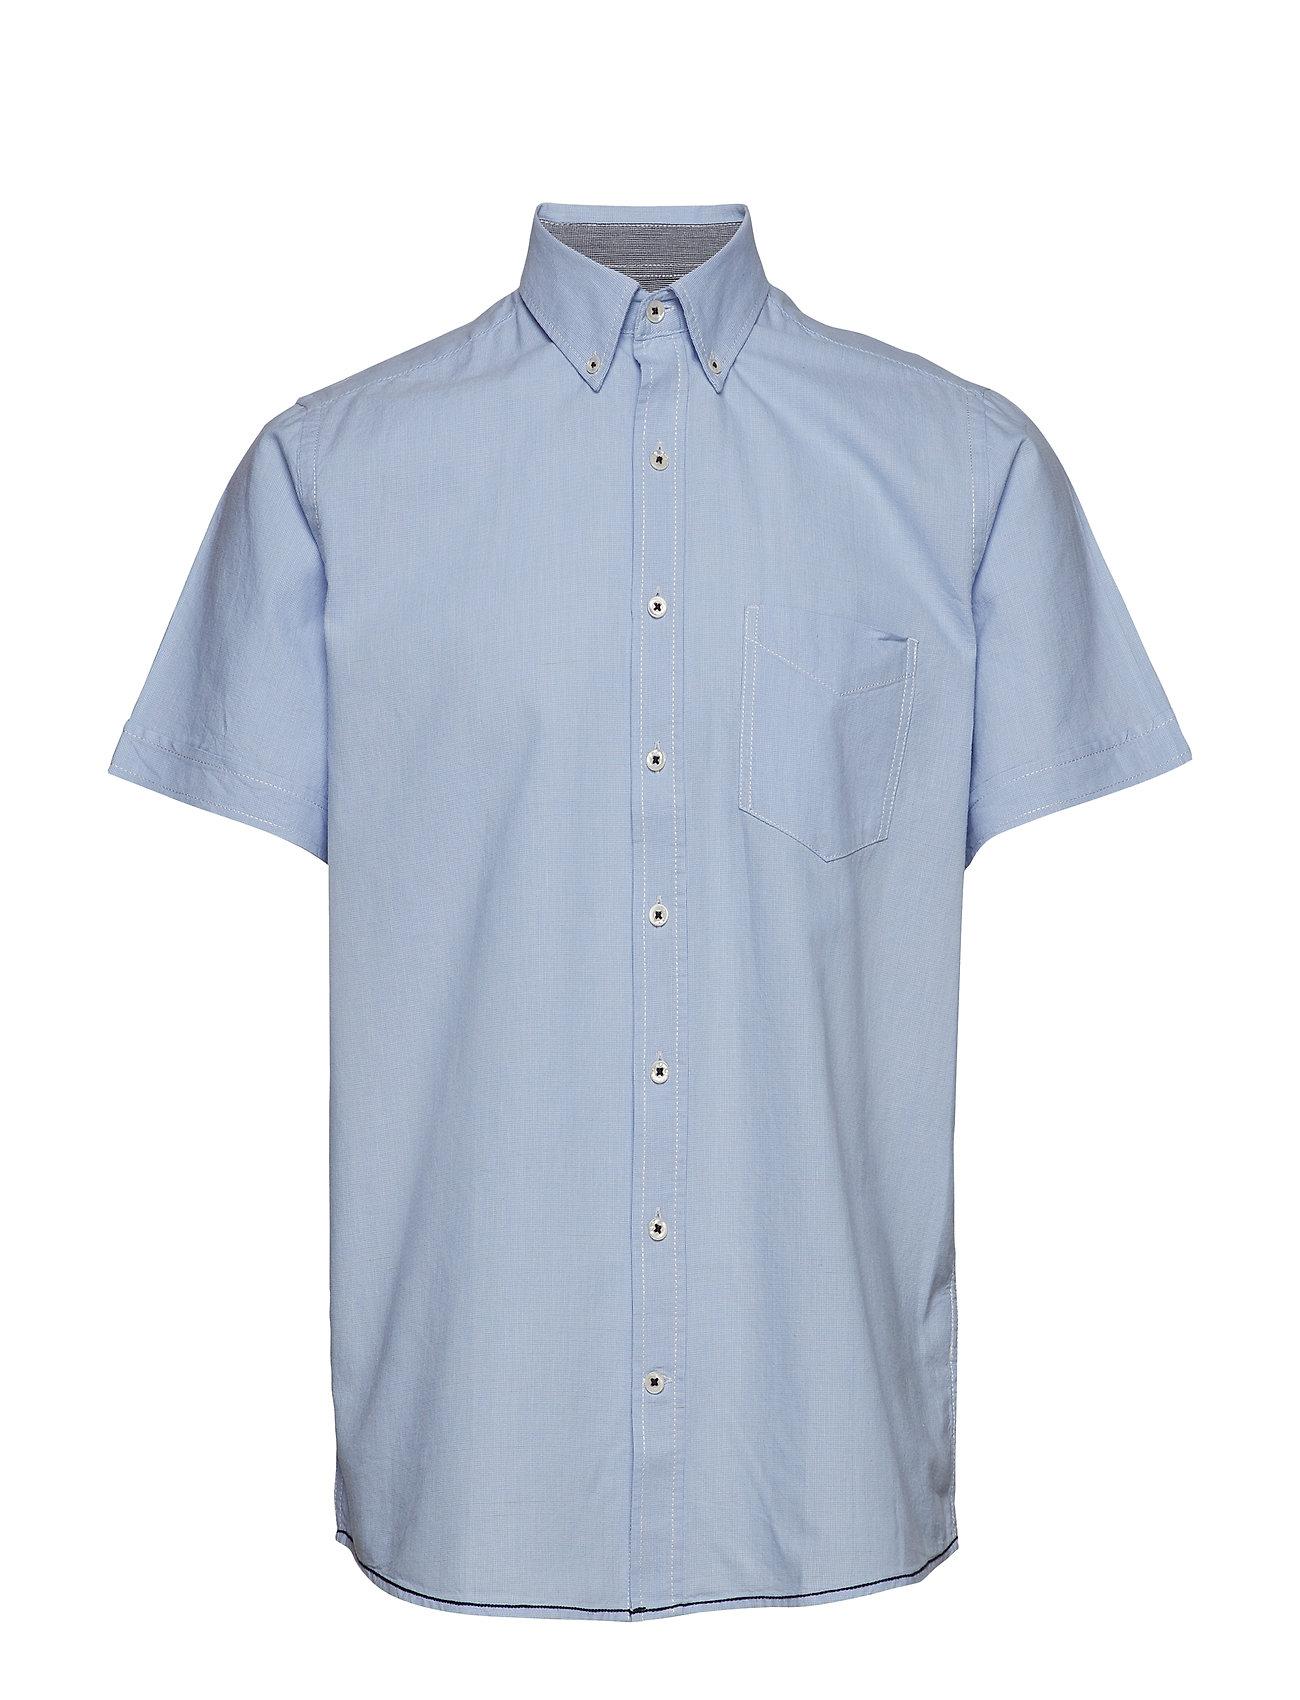 Signal S/S Shirts - POND BLUE